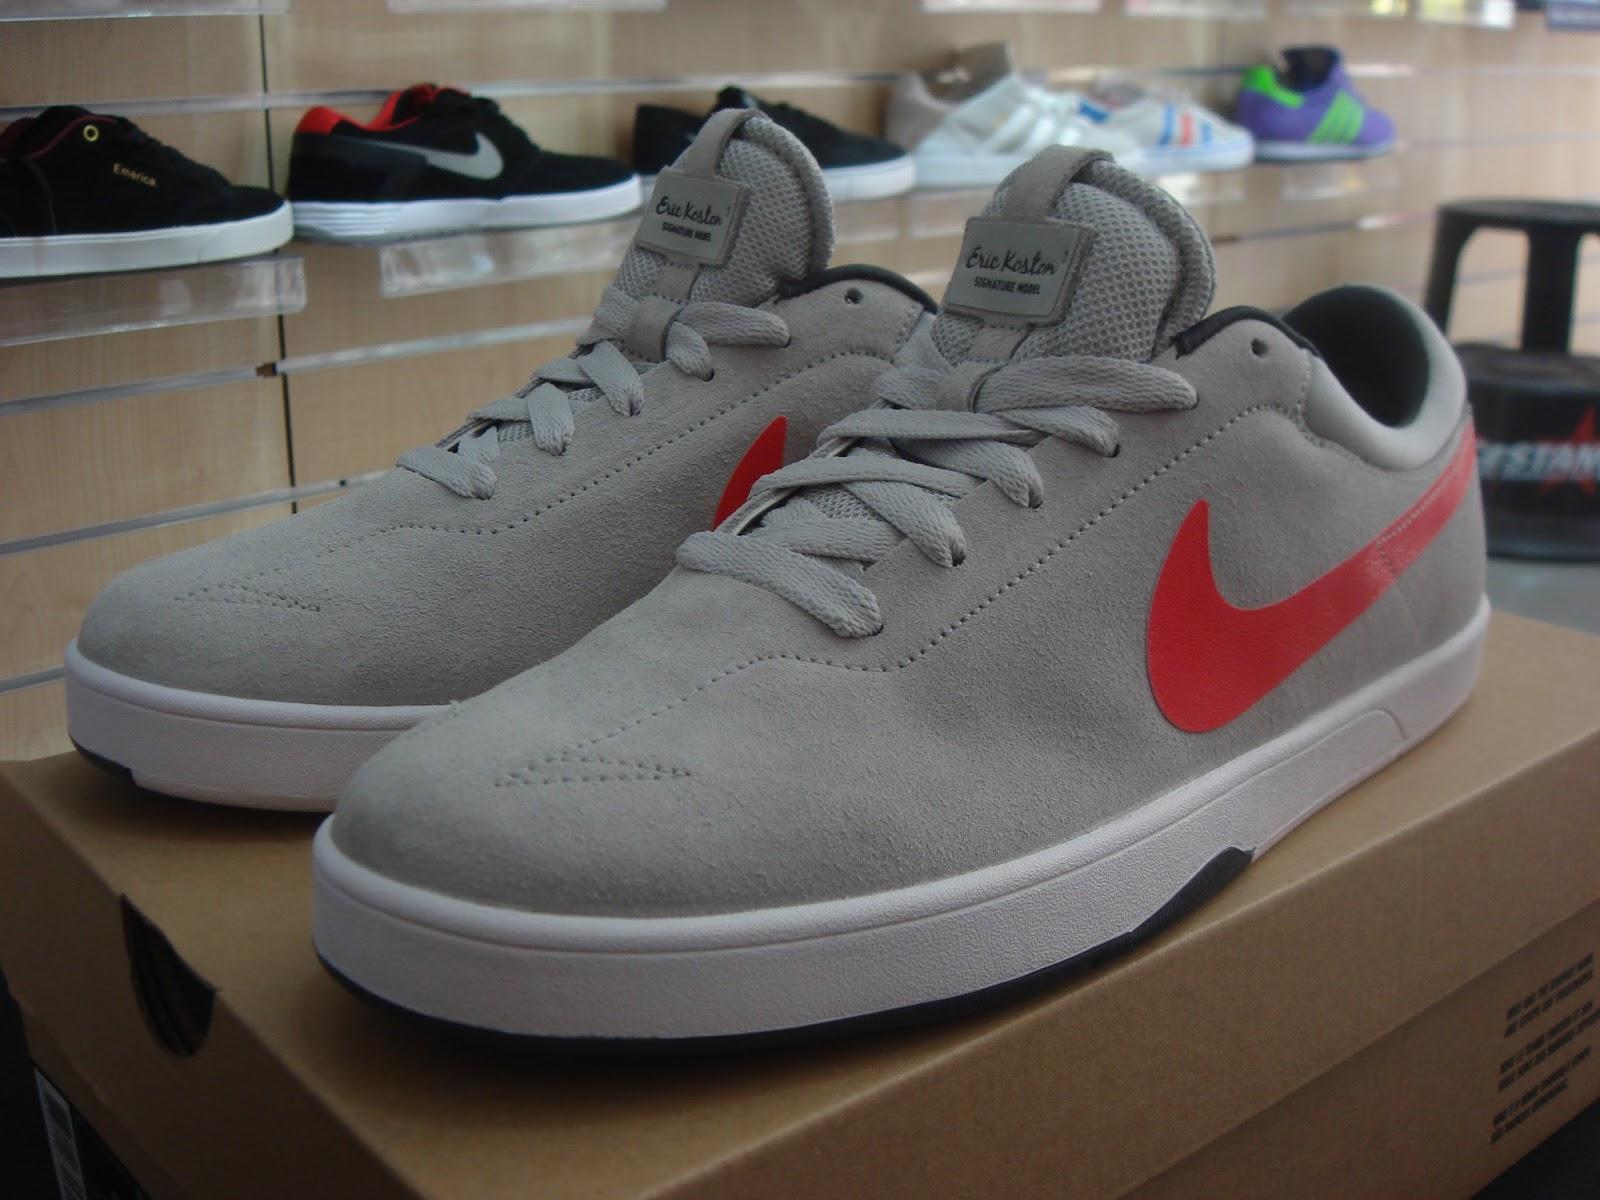 Stance Skateboard Shop: Más Nike que nunca!